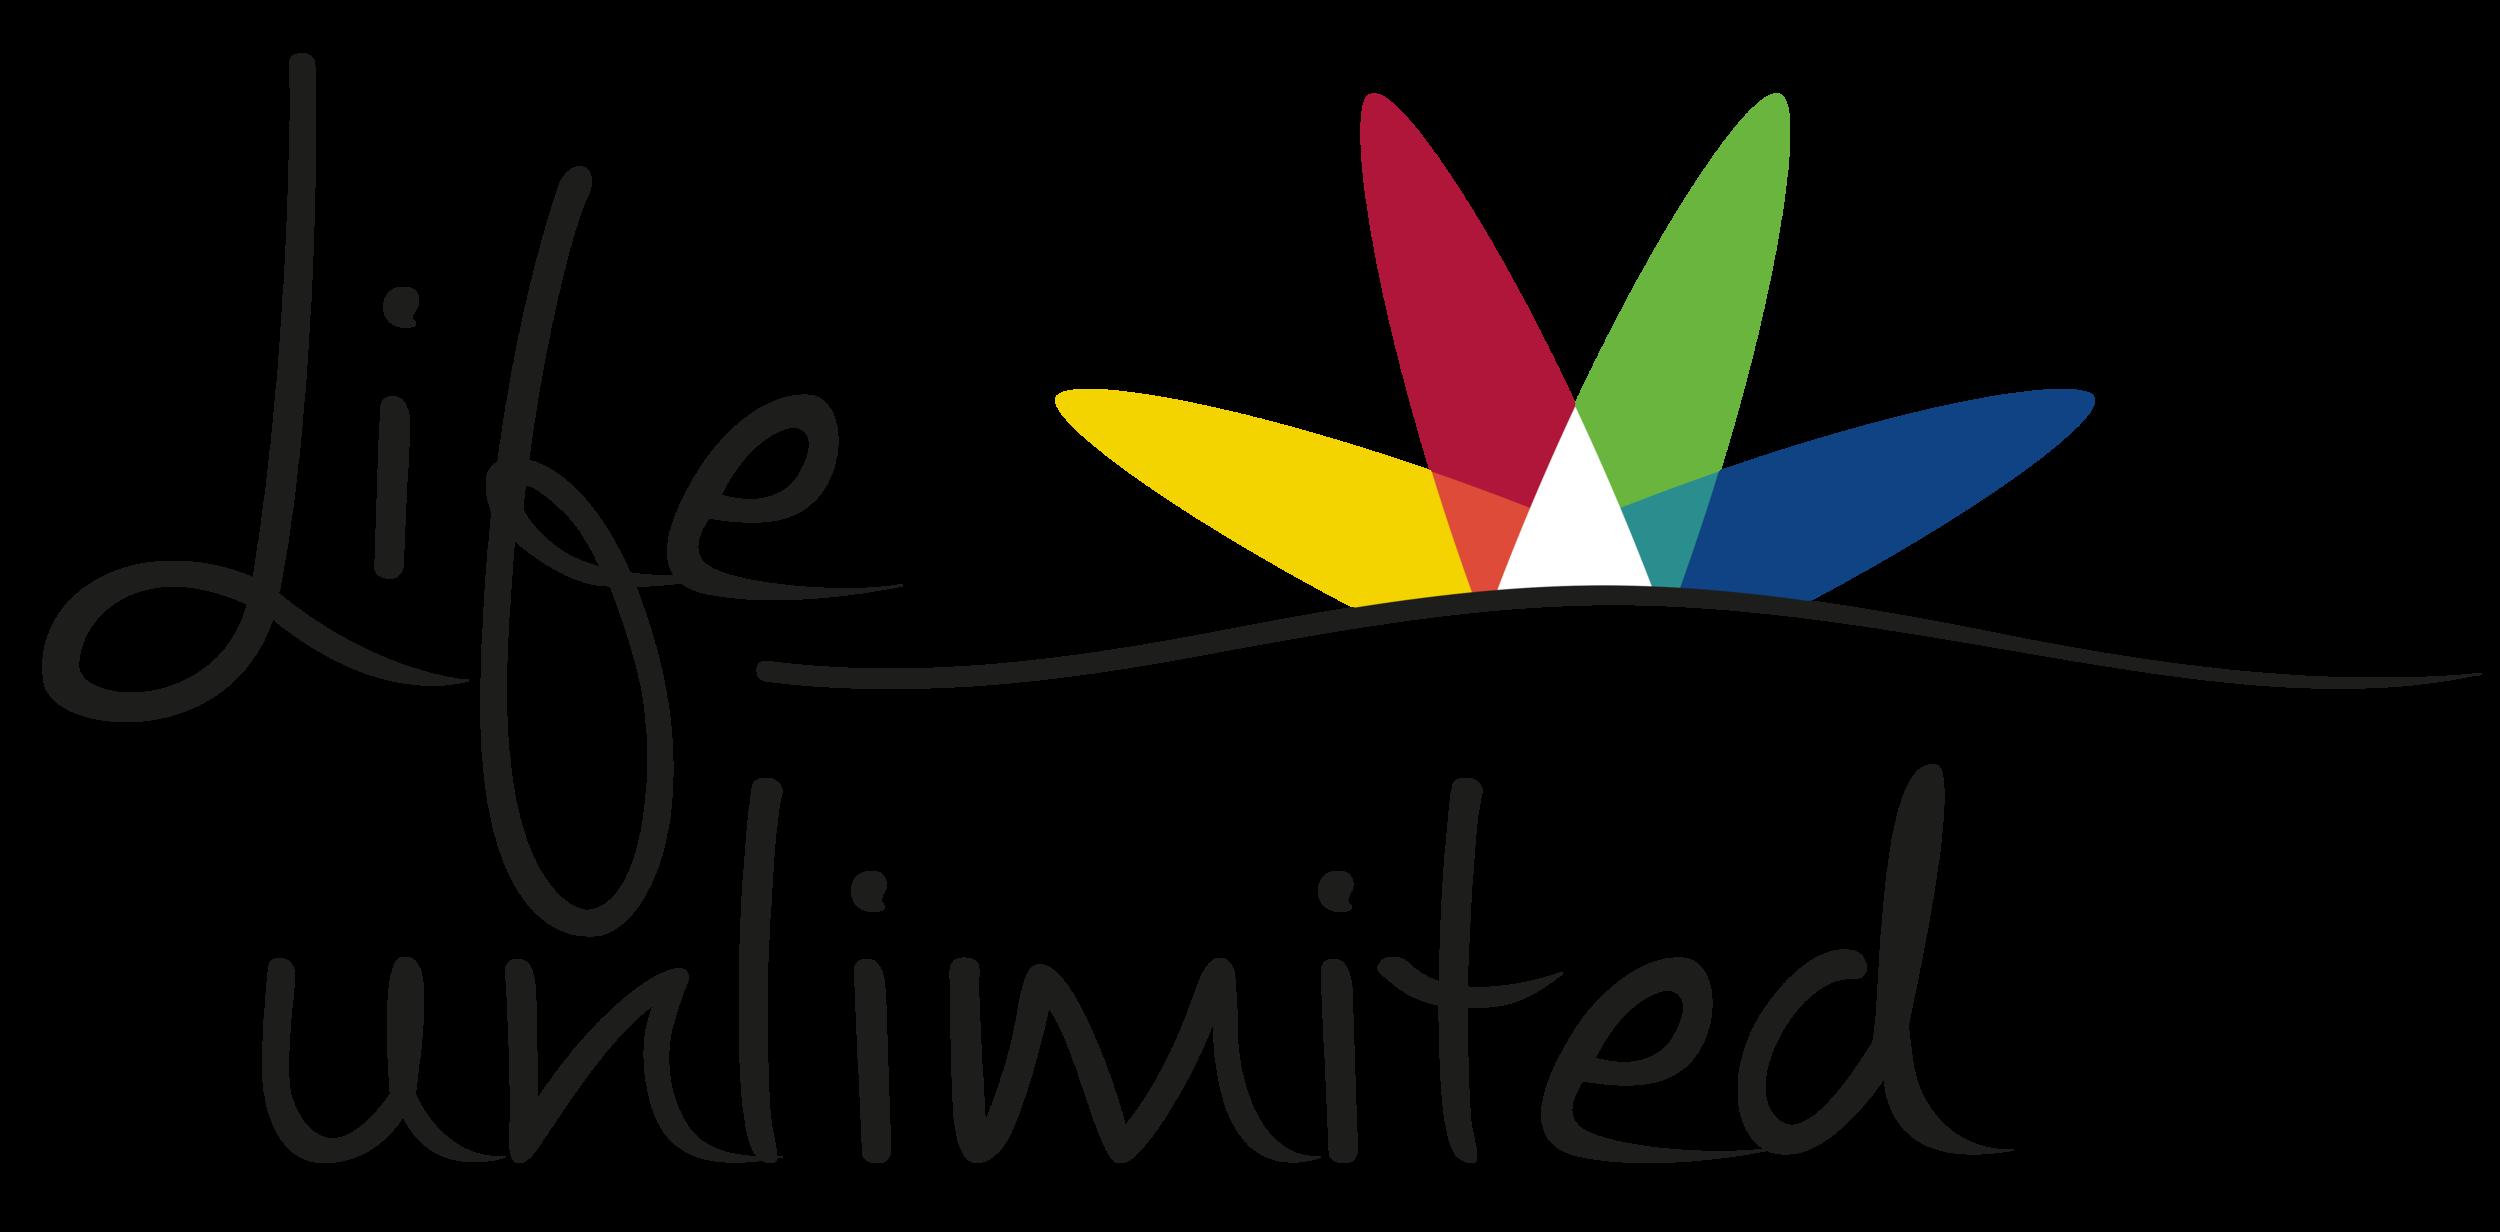 Life_Unlimited_Logo_Original.png